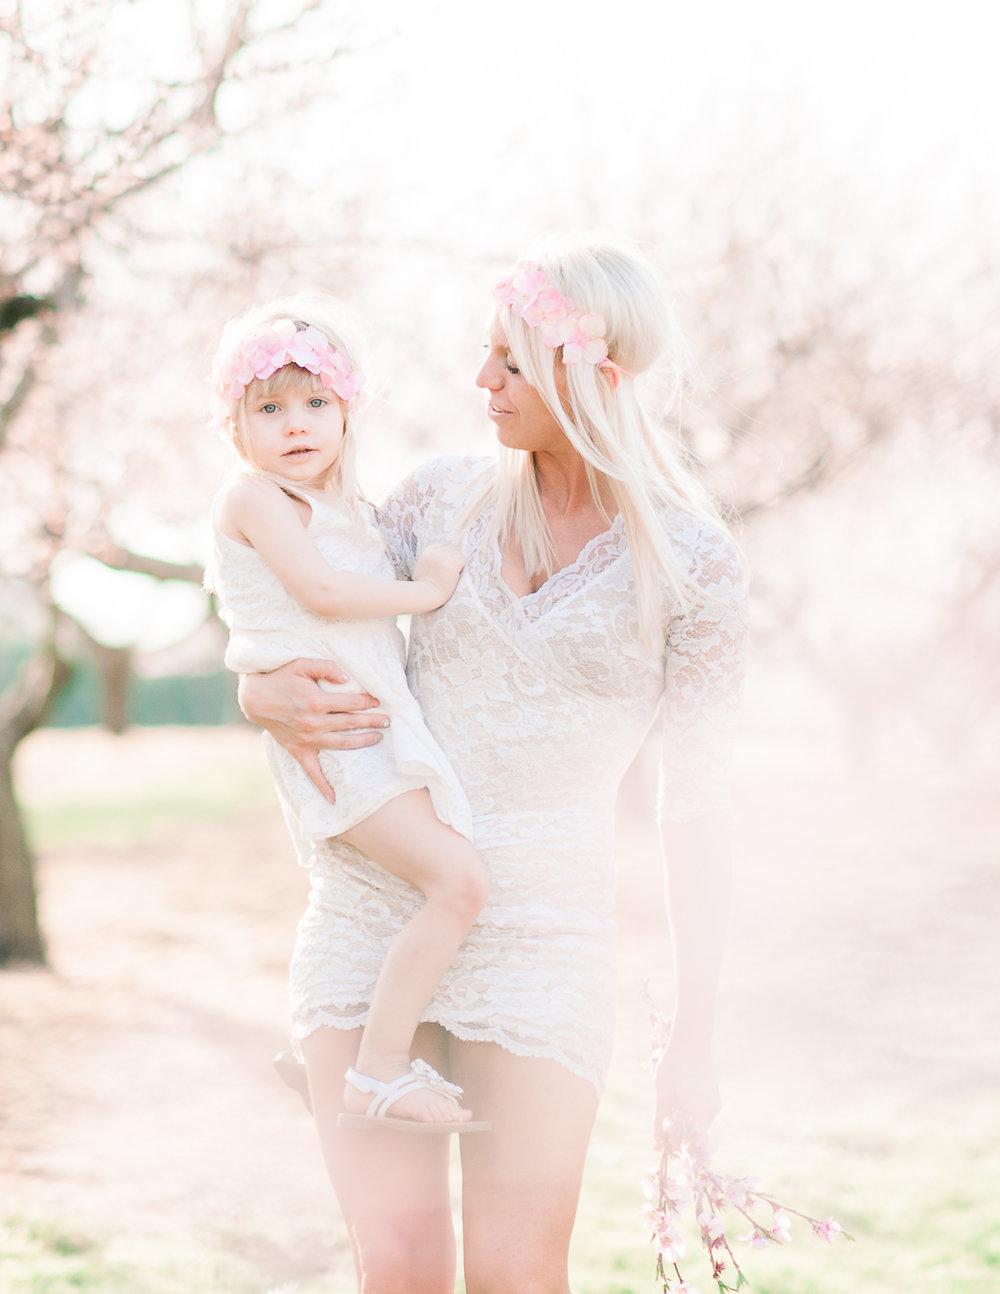 fredericksburgphotographer_cherryblossoms_MomandMe_familyphotos_youseephotography_Sarahfam (46).JPG